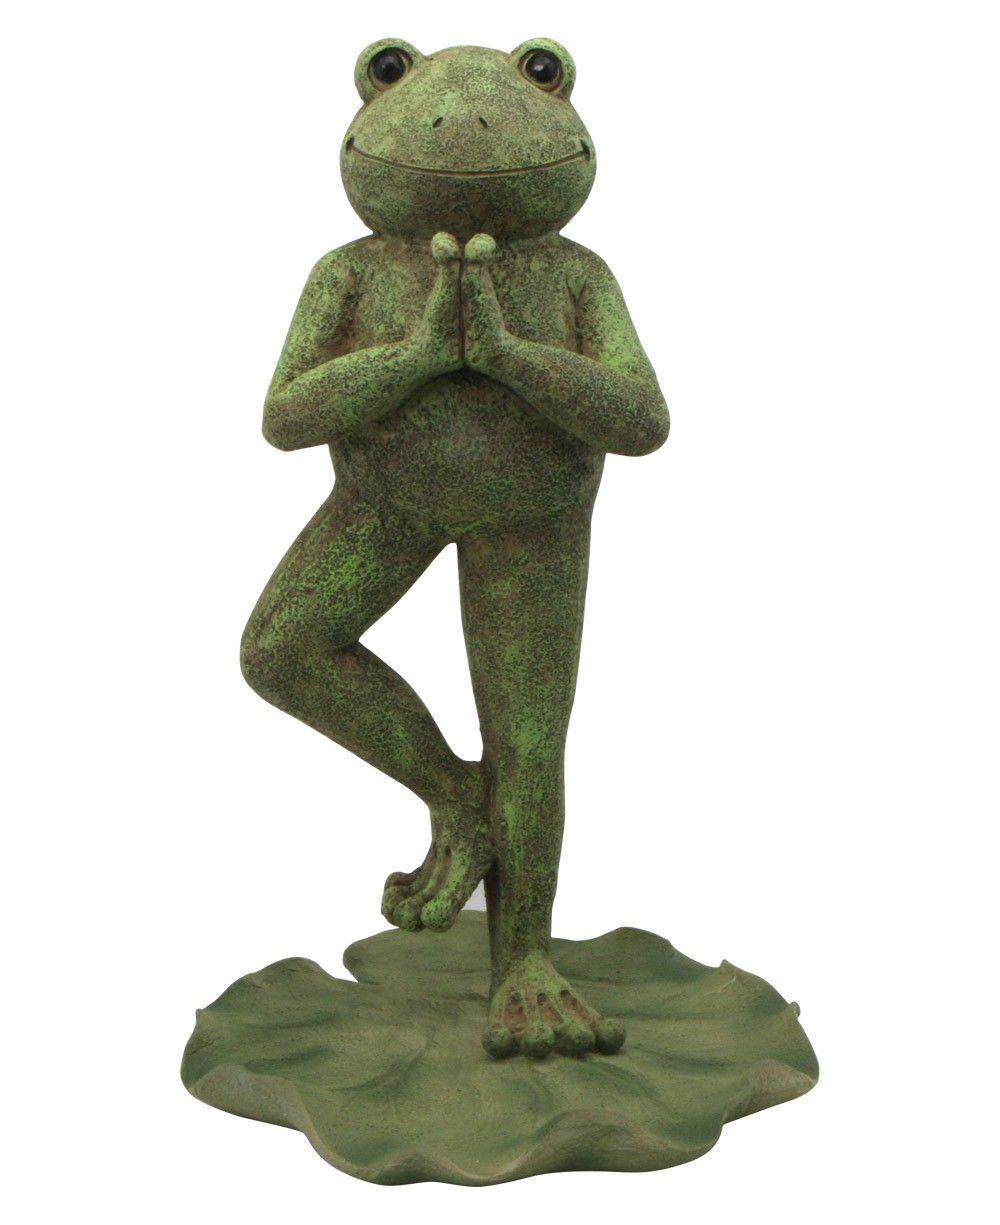 Yoga Frog Garden Statues Garden Statues Frog Decor Frog Pictures